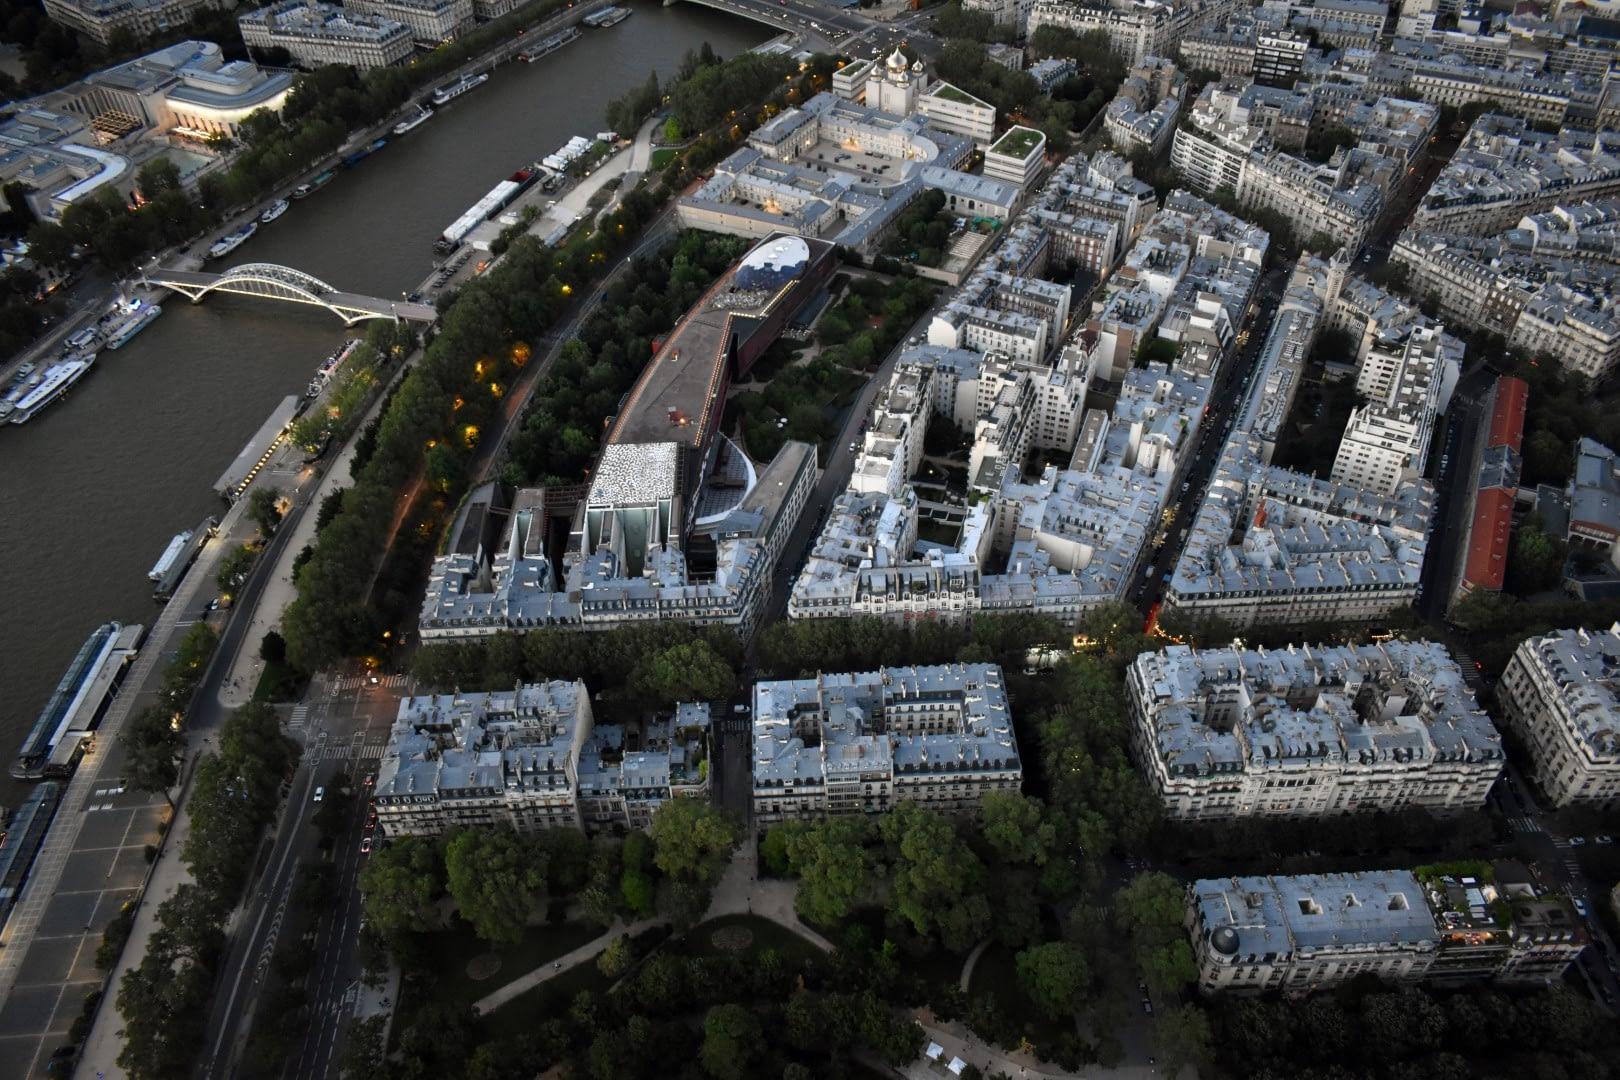 Quai Branly, top of the Eiffel Tower, Paris